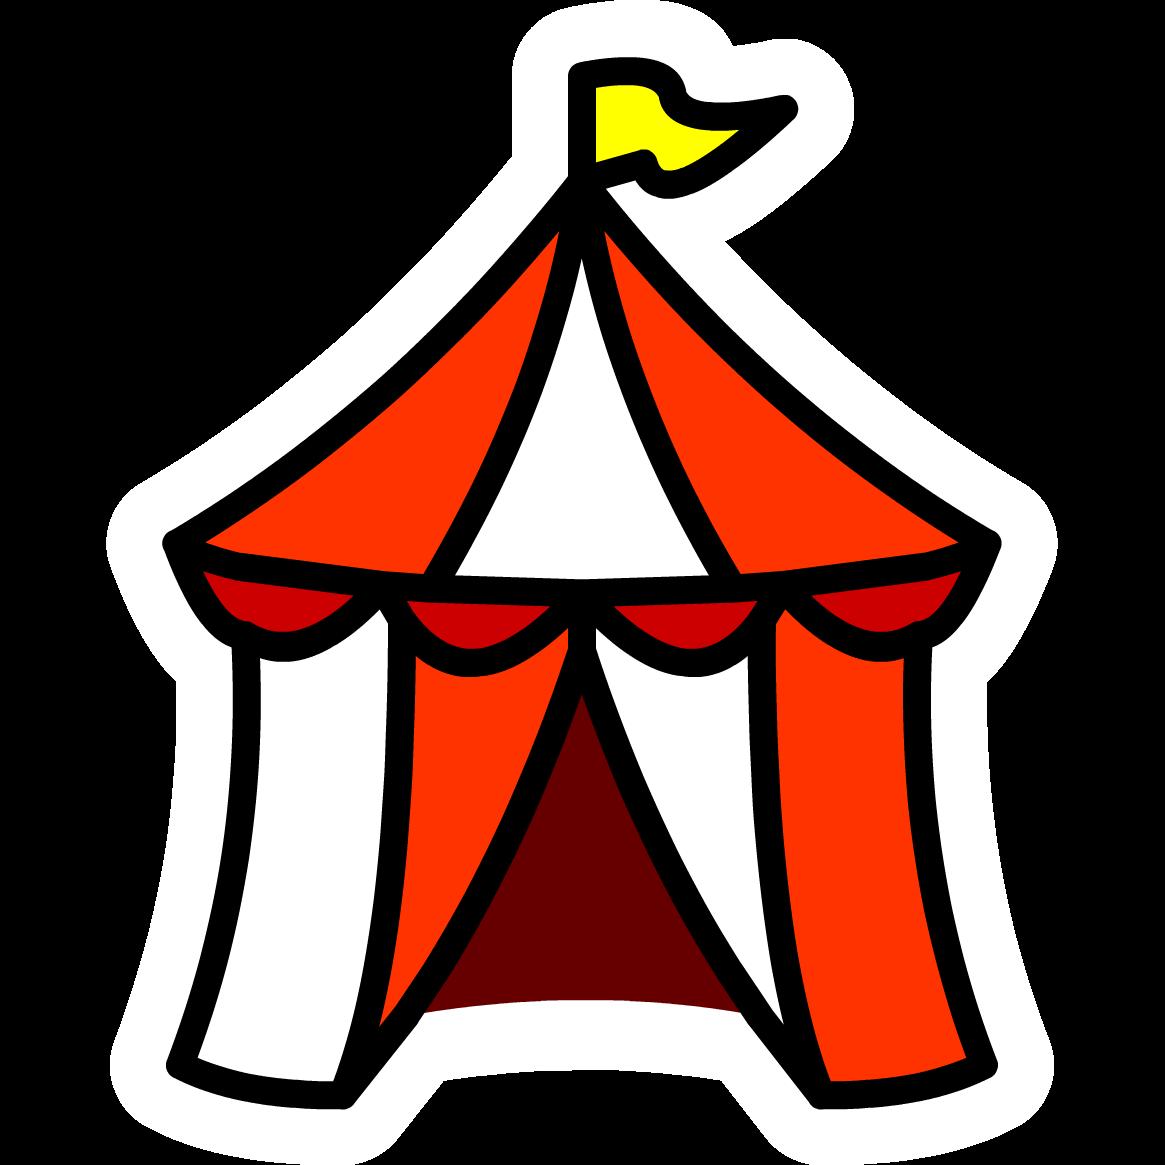 Free Circus Tent Pics, Download Free Clip Art, Free Clip Art on ... graphic transparent download